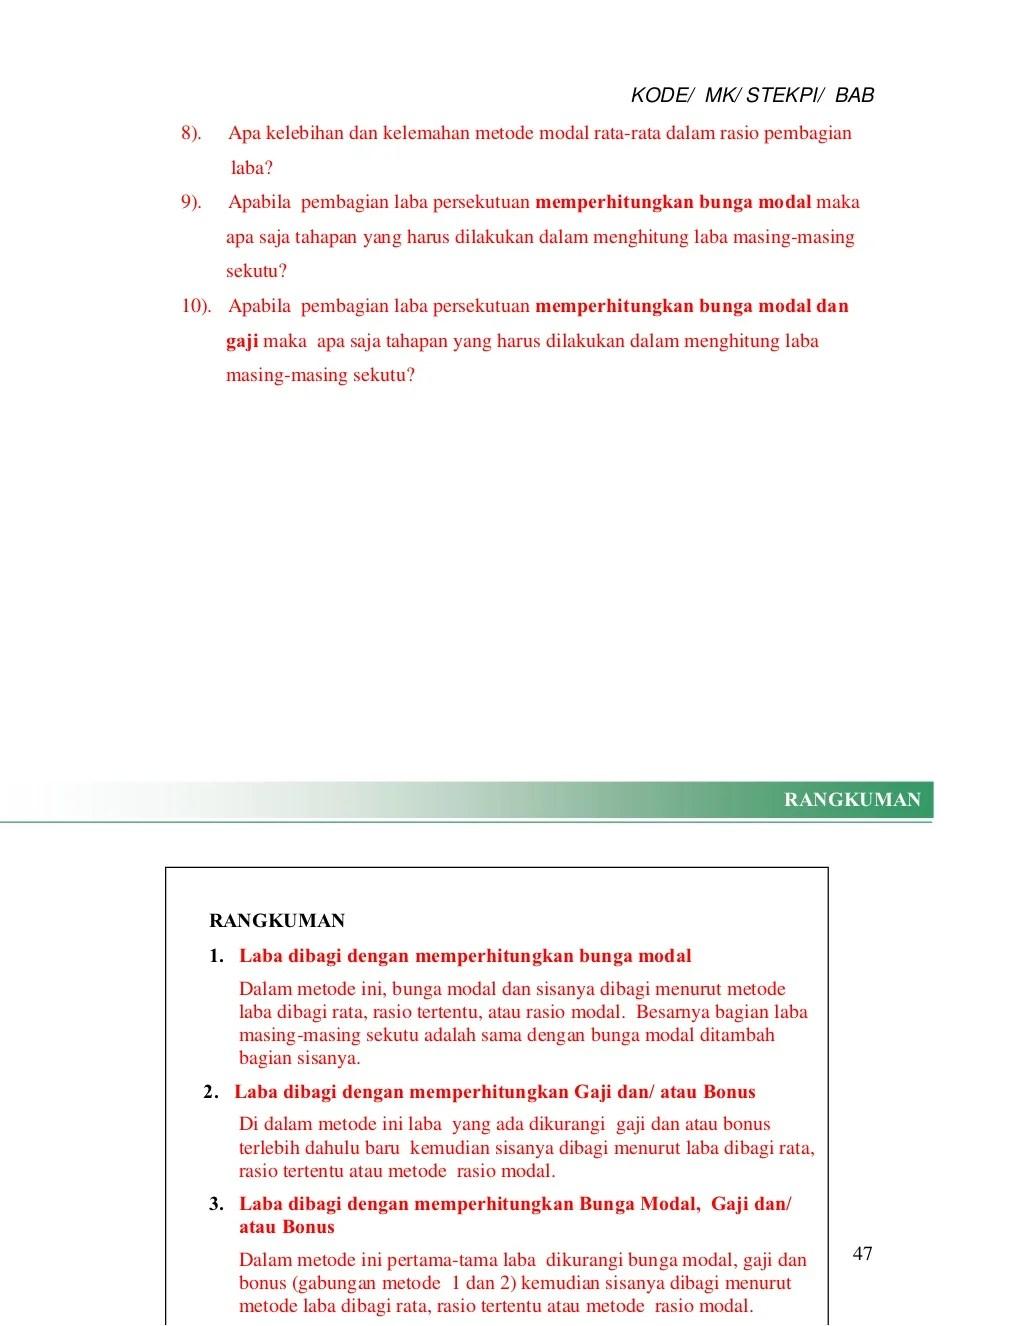 Lembke, thomas e.king, dan cynthia g.jeffrey, dengan keunikan lingkungan usaha di indonesia. Akuntansi Keuangan Lanjutan I